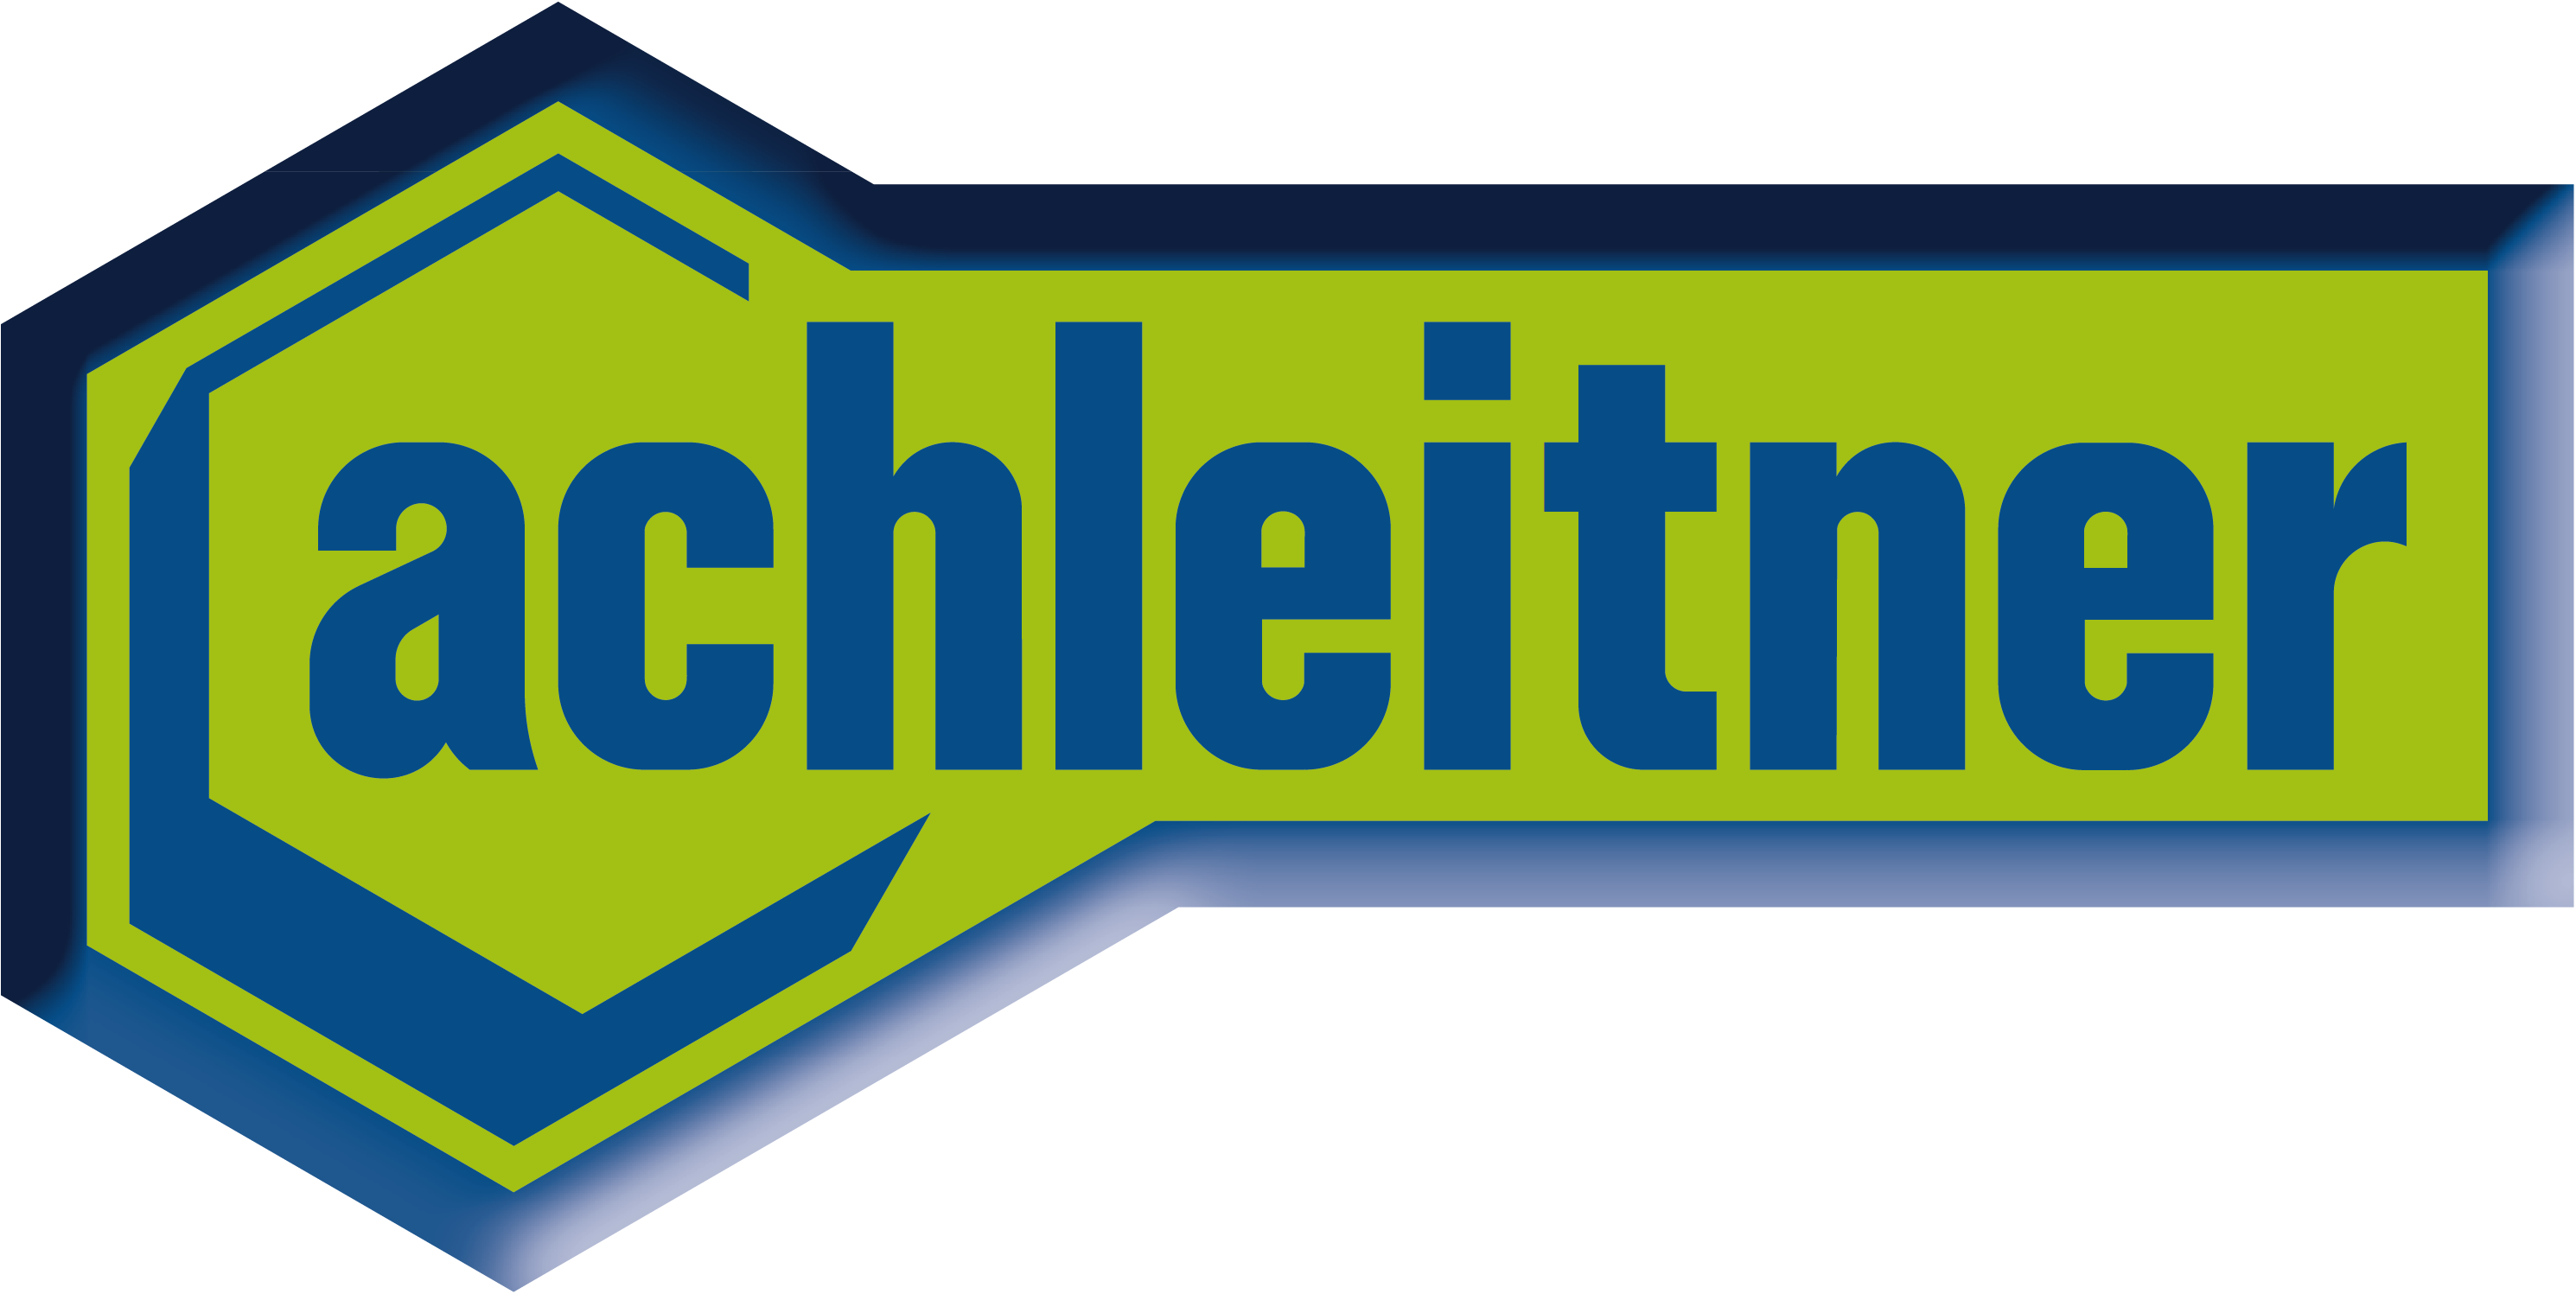 Achleitner Logo